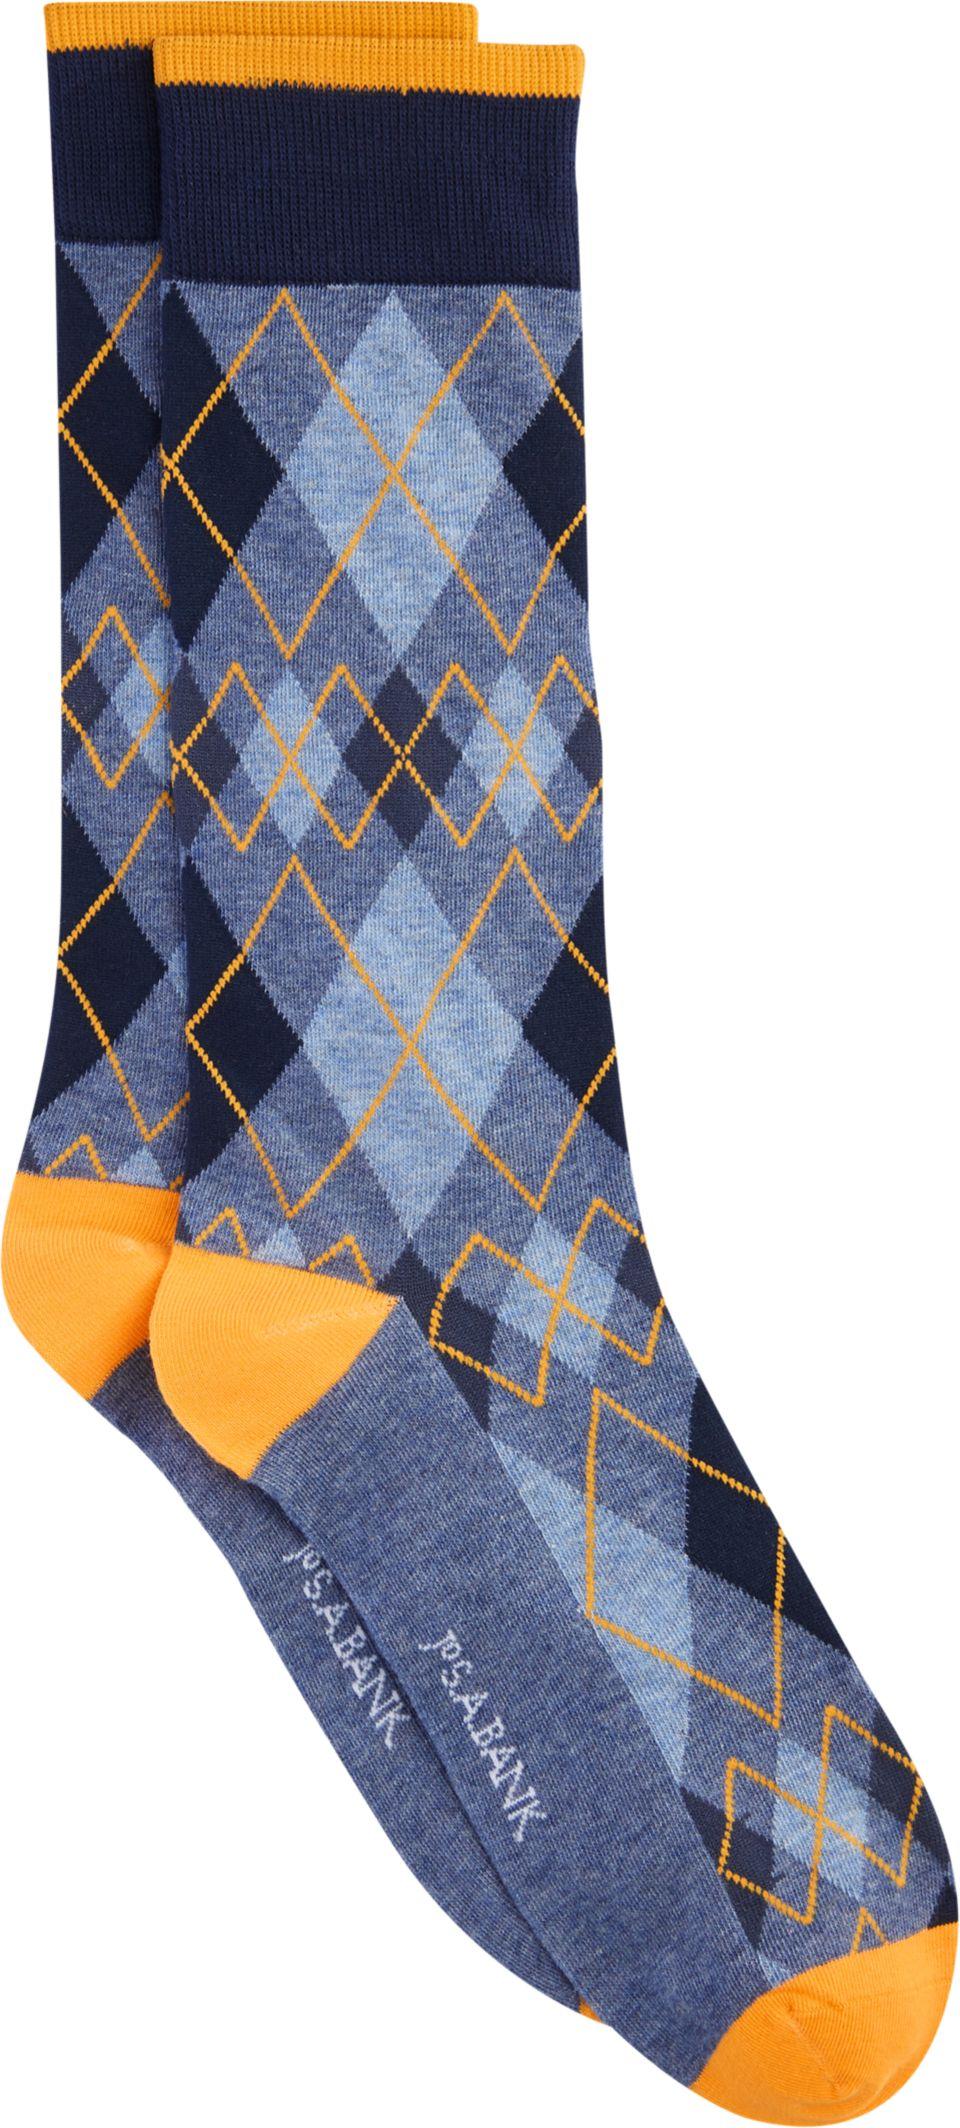 7408afa51f0f Jos. A. Bank Diamond Pattern Socks, 1-Pair   Products   Patterned ...